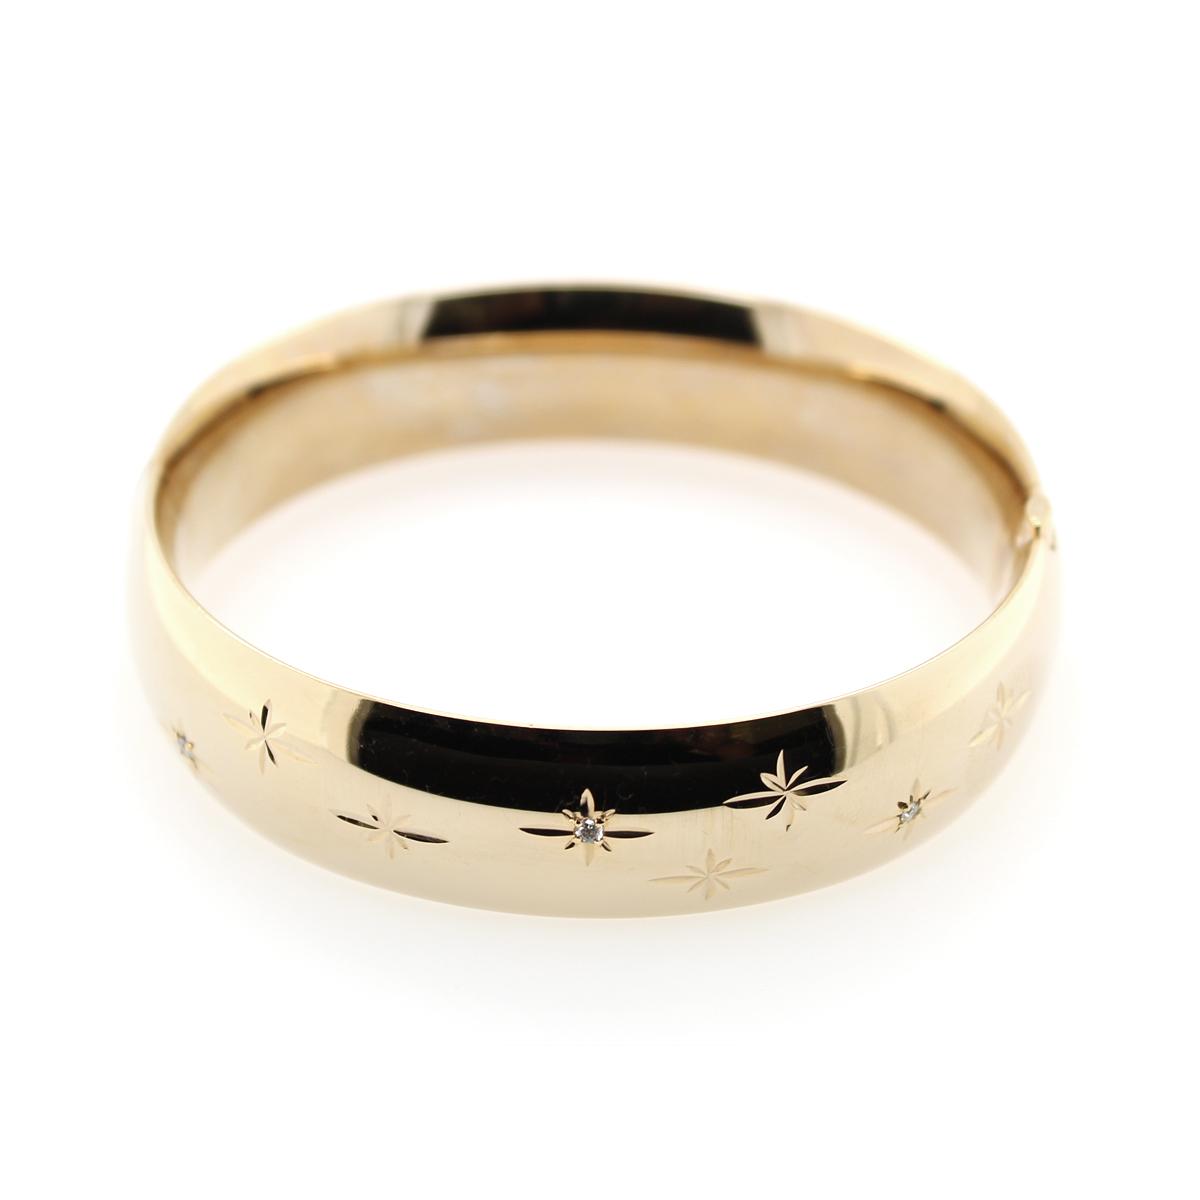 14 Karat Yellow Gold Filled 16mm Diamond Bangle Bracelet